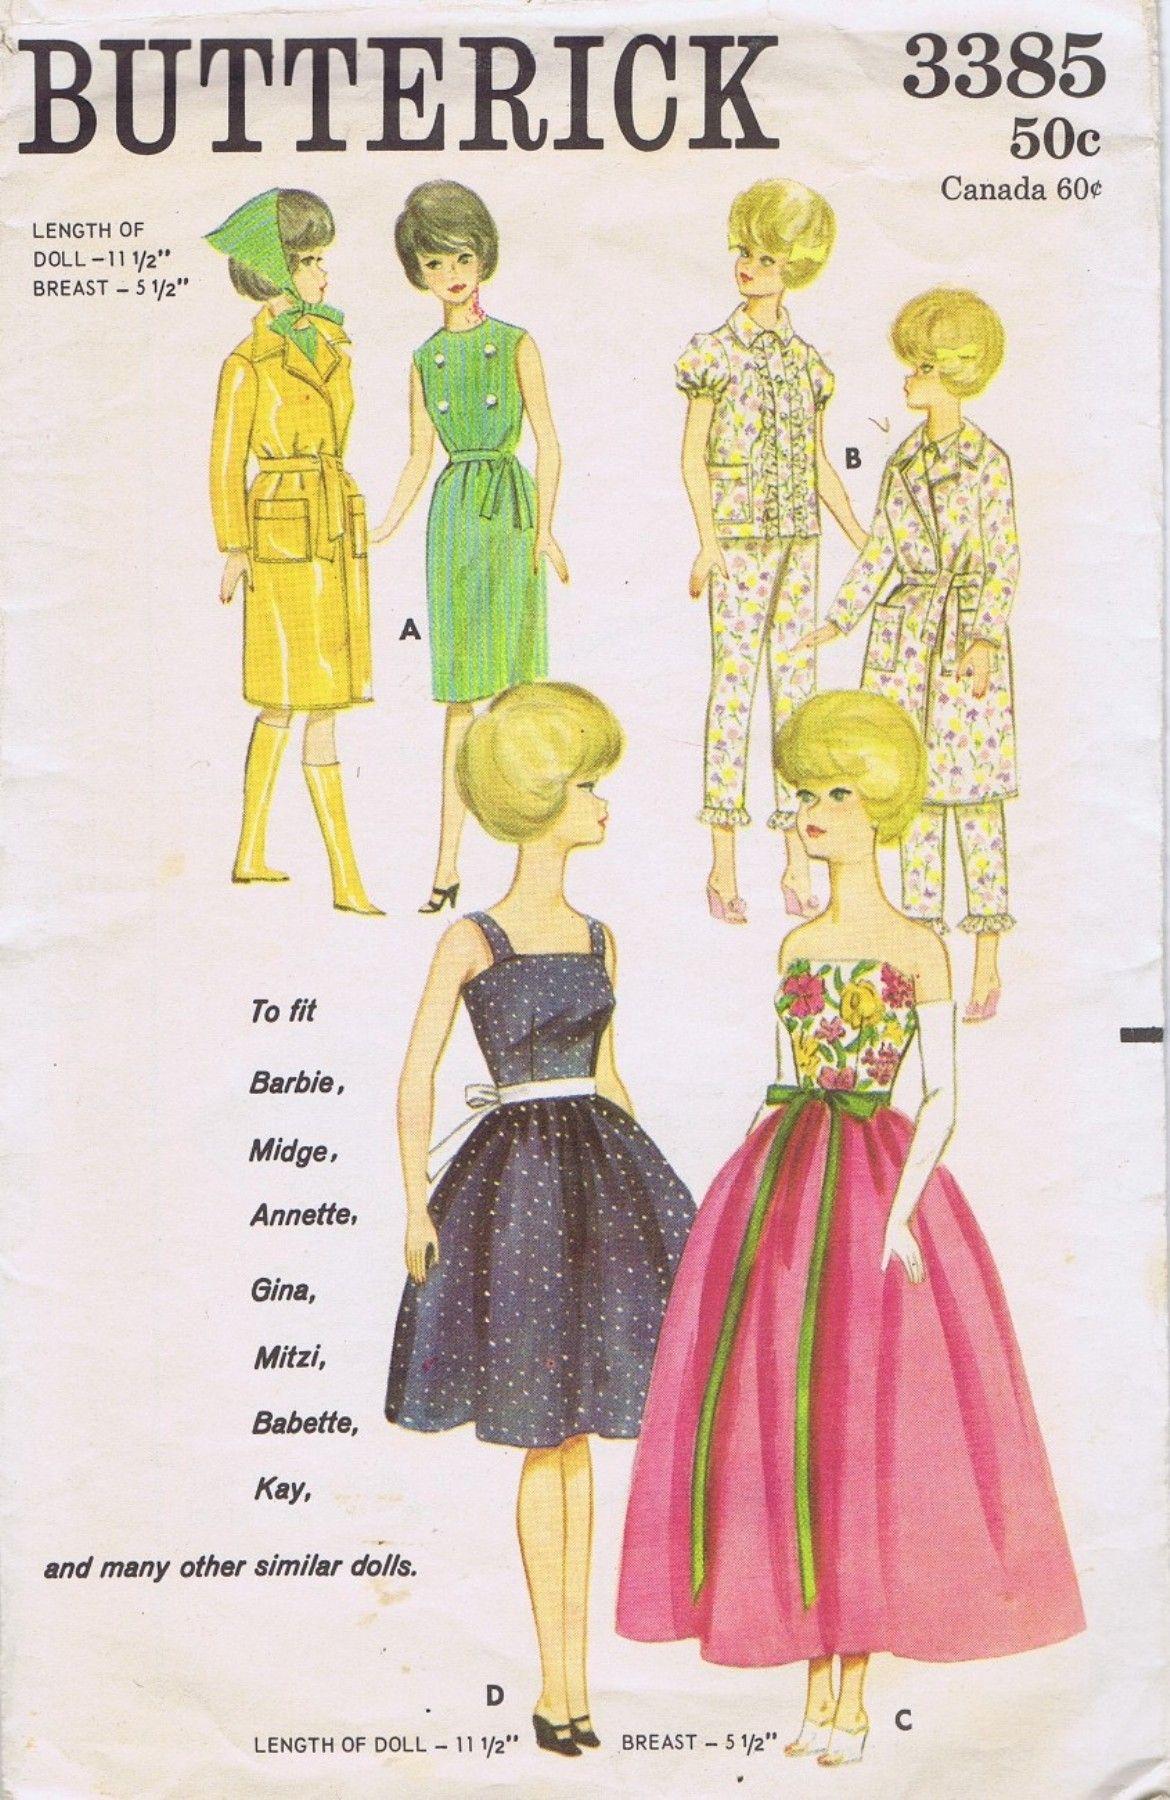 3385 Butterick | Barbie Silkstone & Fashion Royalty Dolls Ruby\'s ...